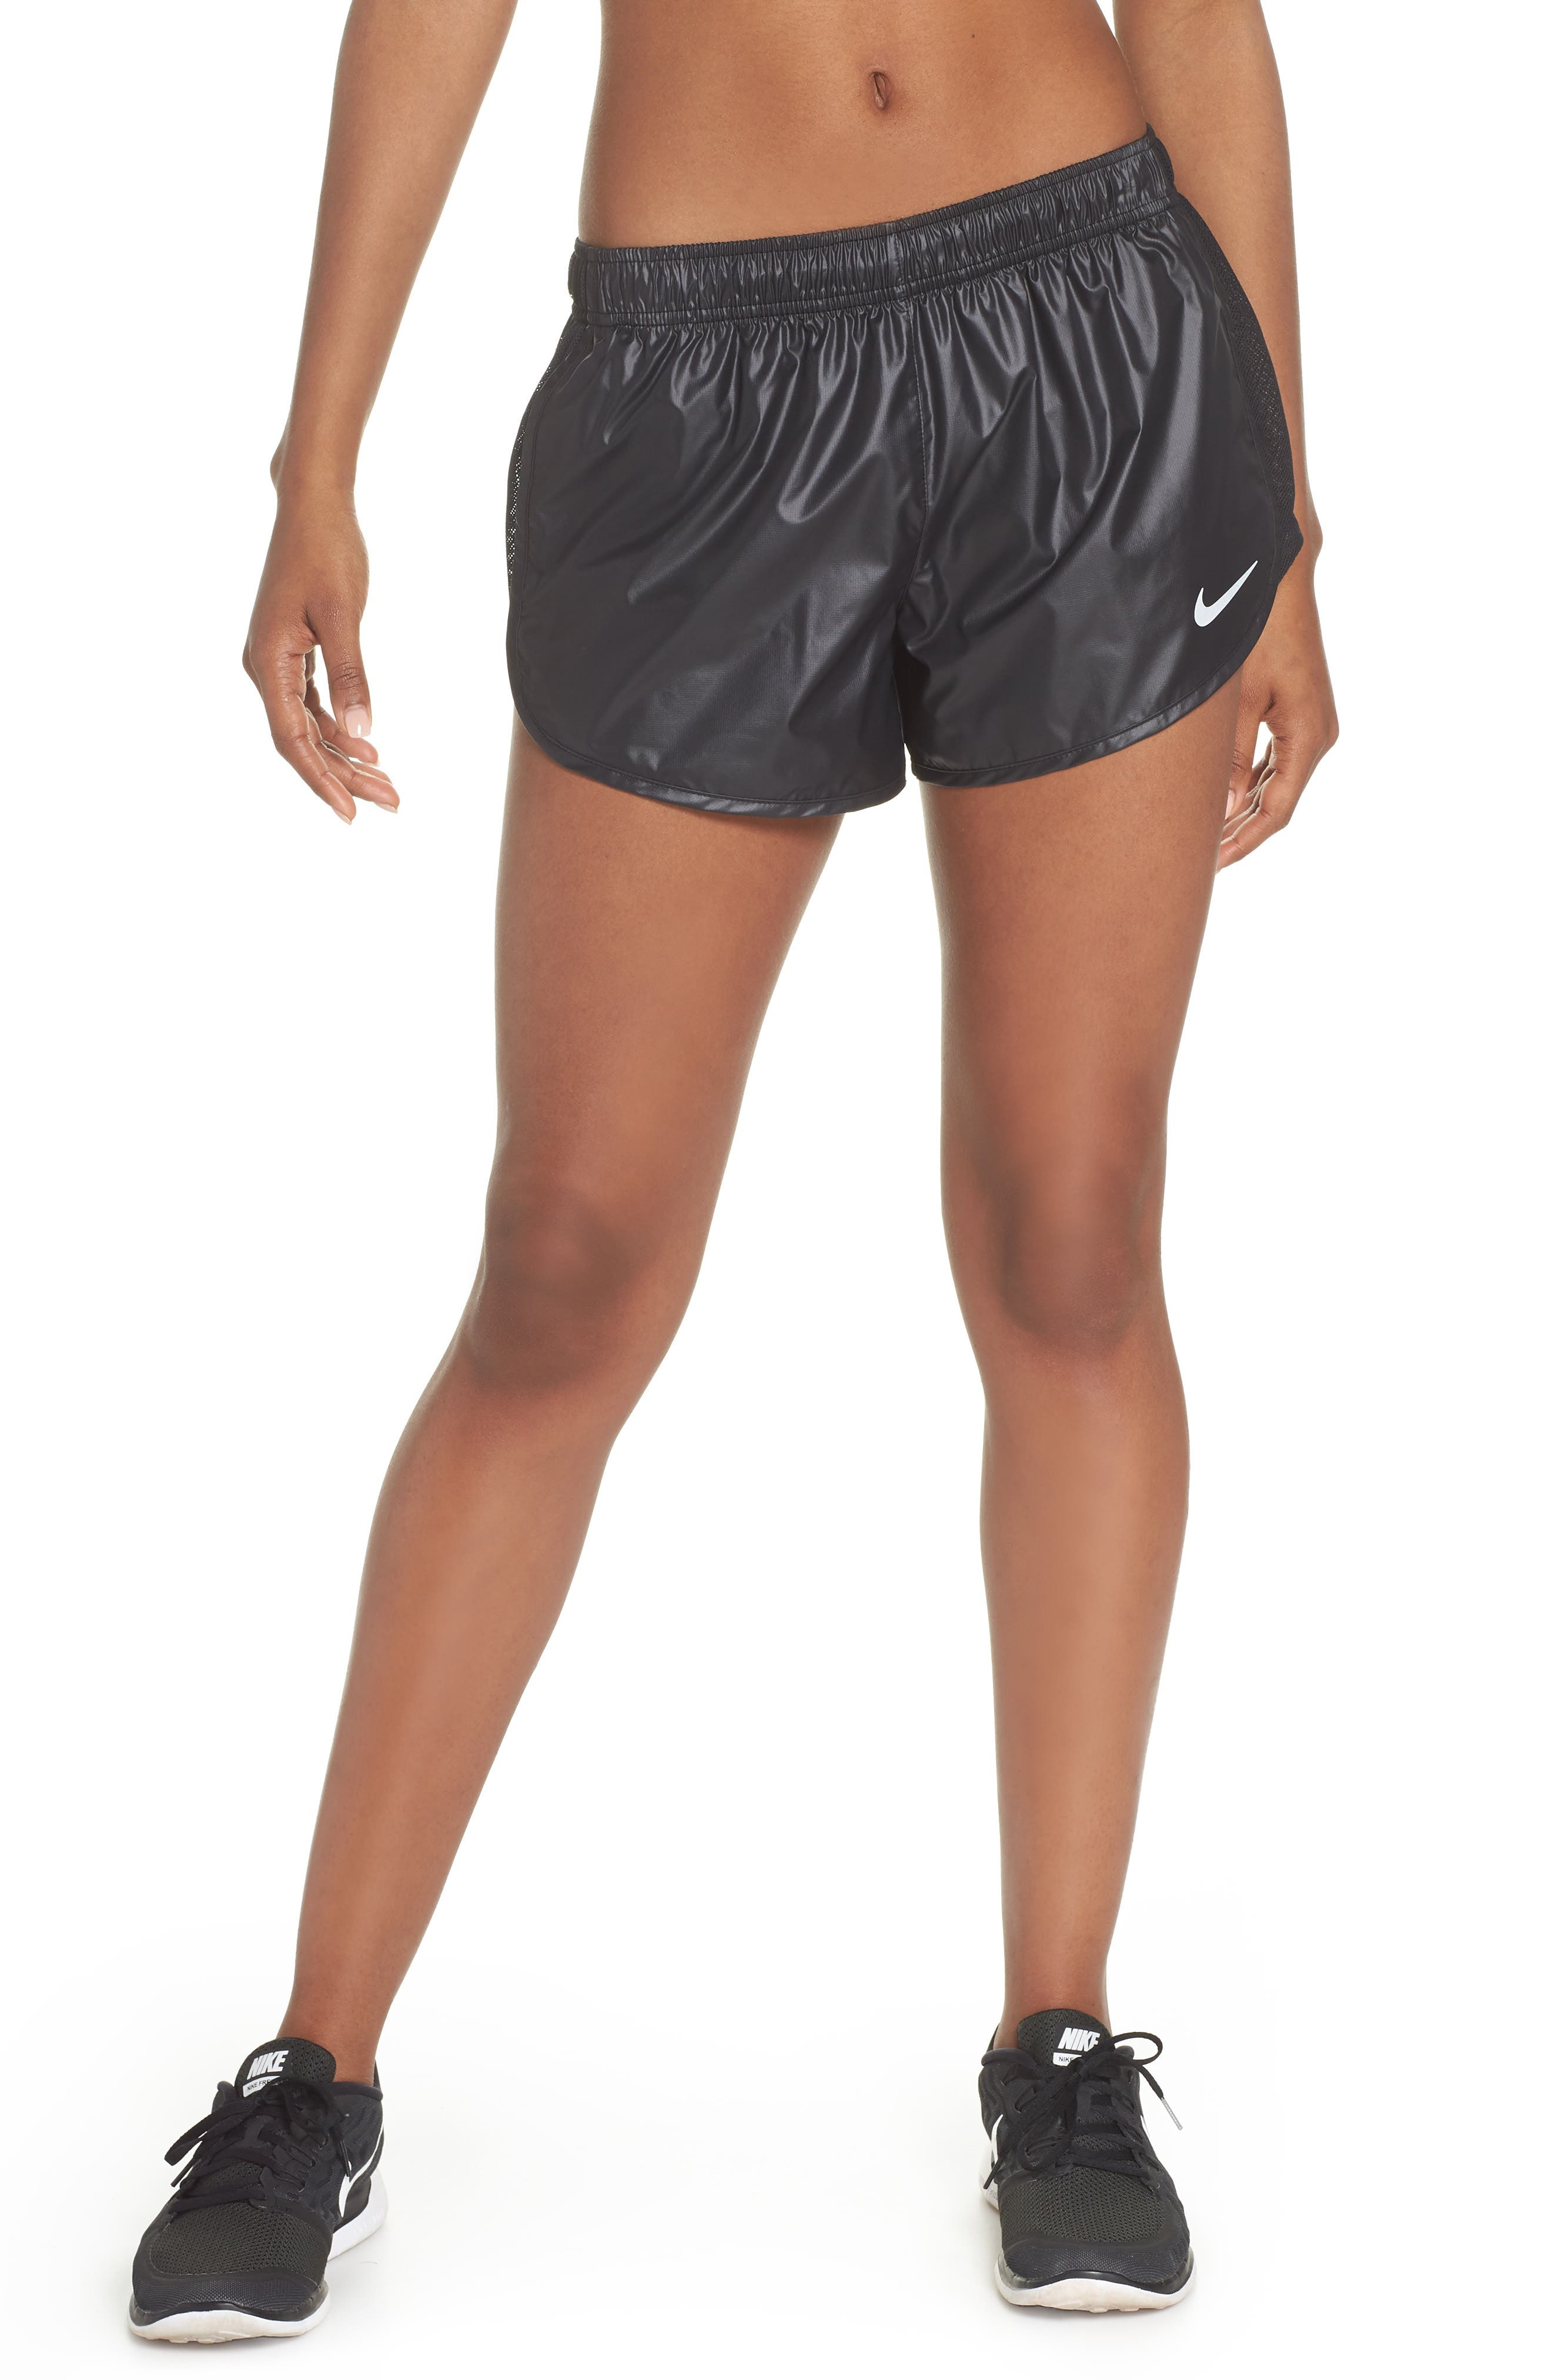 Tempo Running Shorts,                         Main,                         color, 010